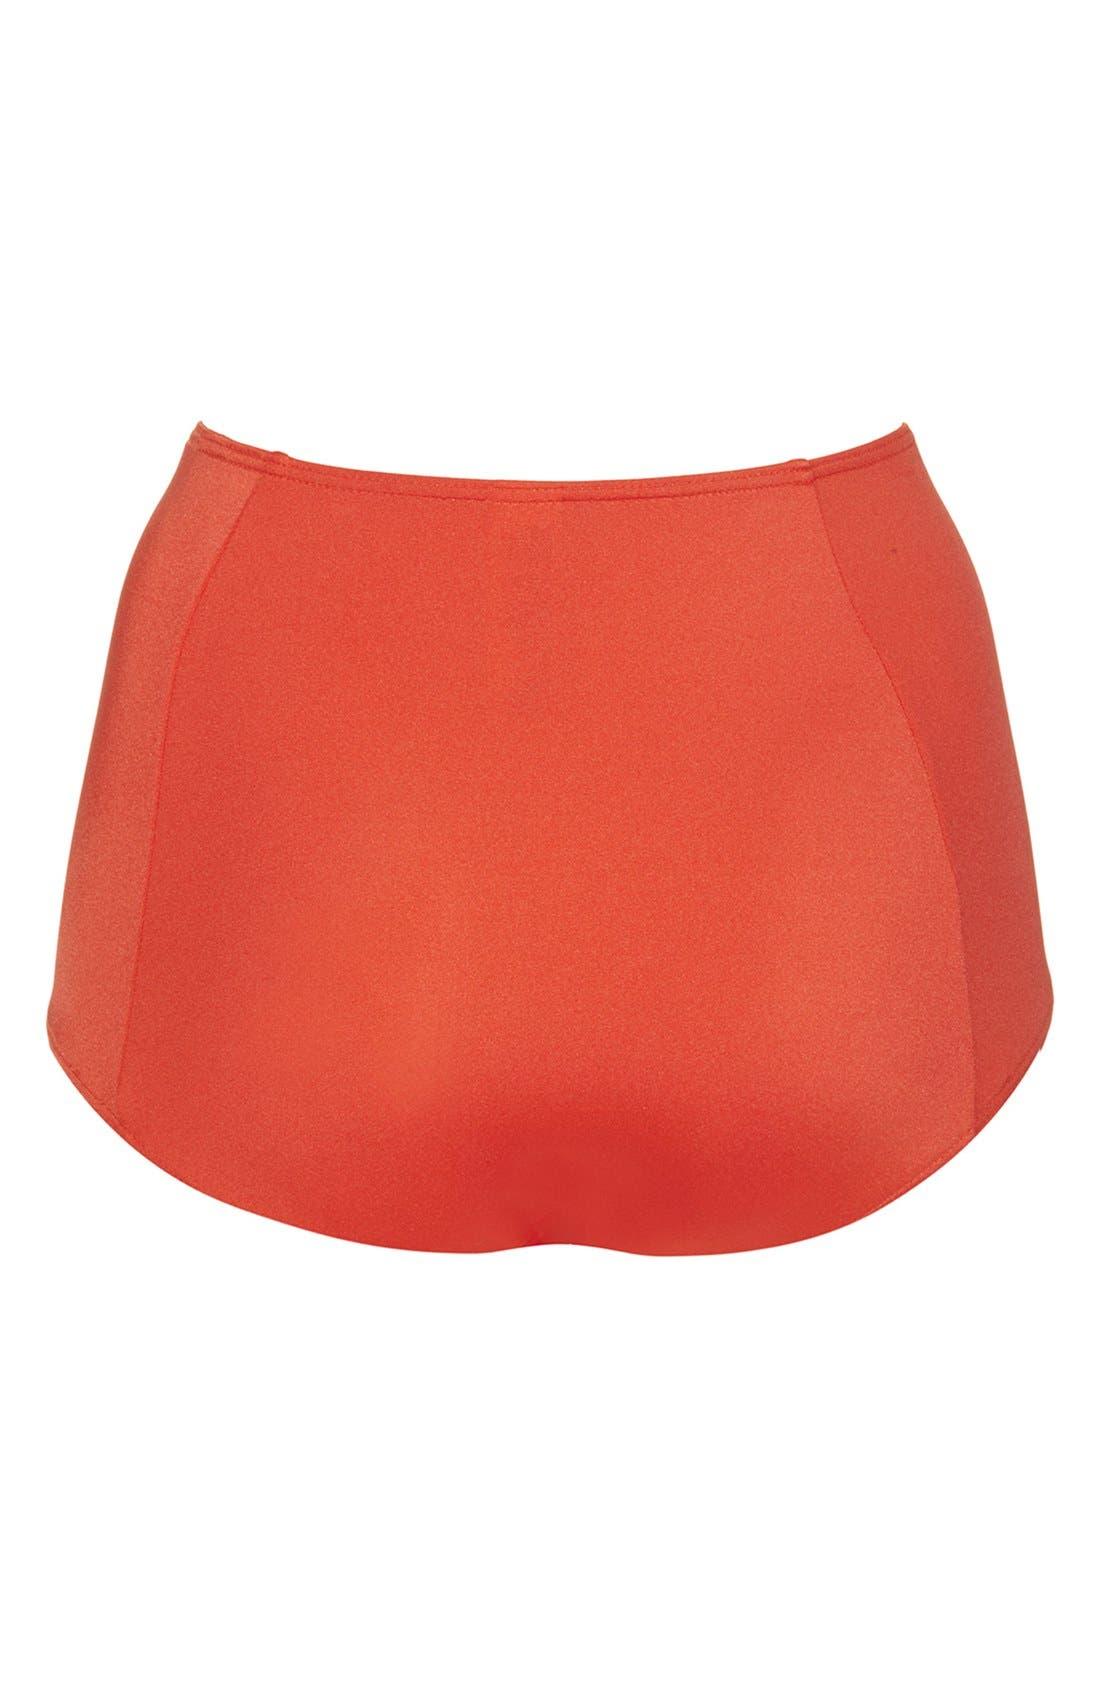 Alternate Image 2  - Topshop High Rise Bikini Bottoms